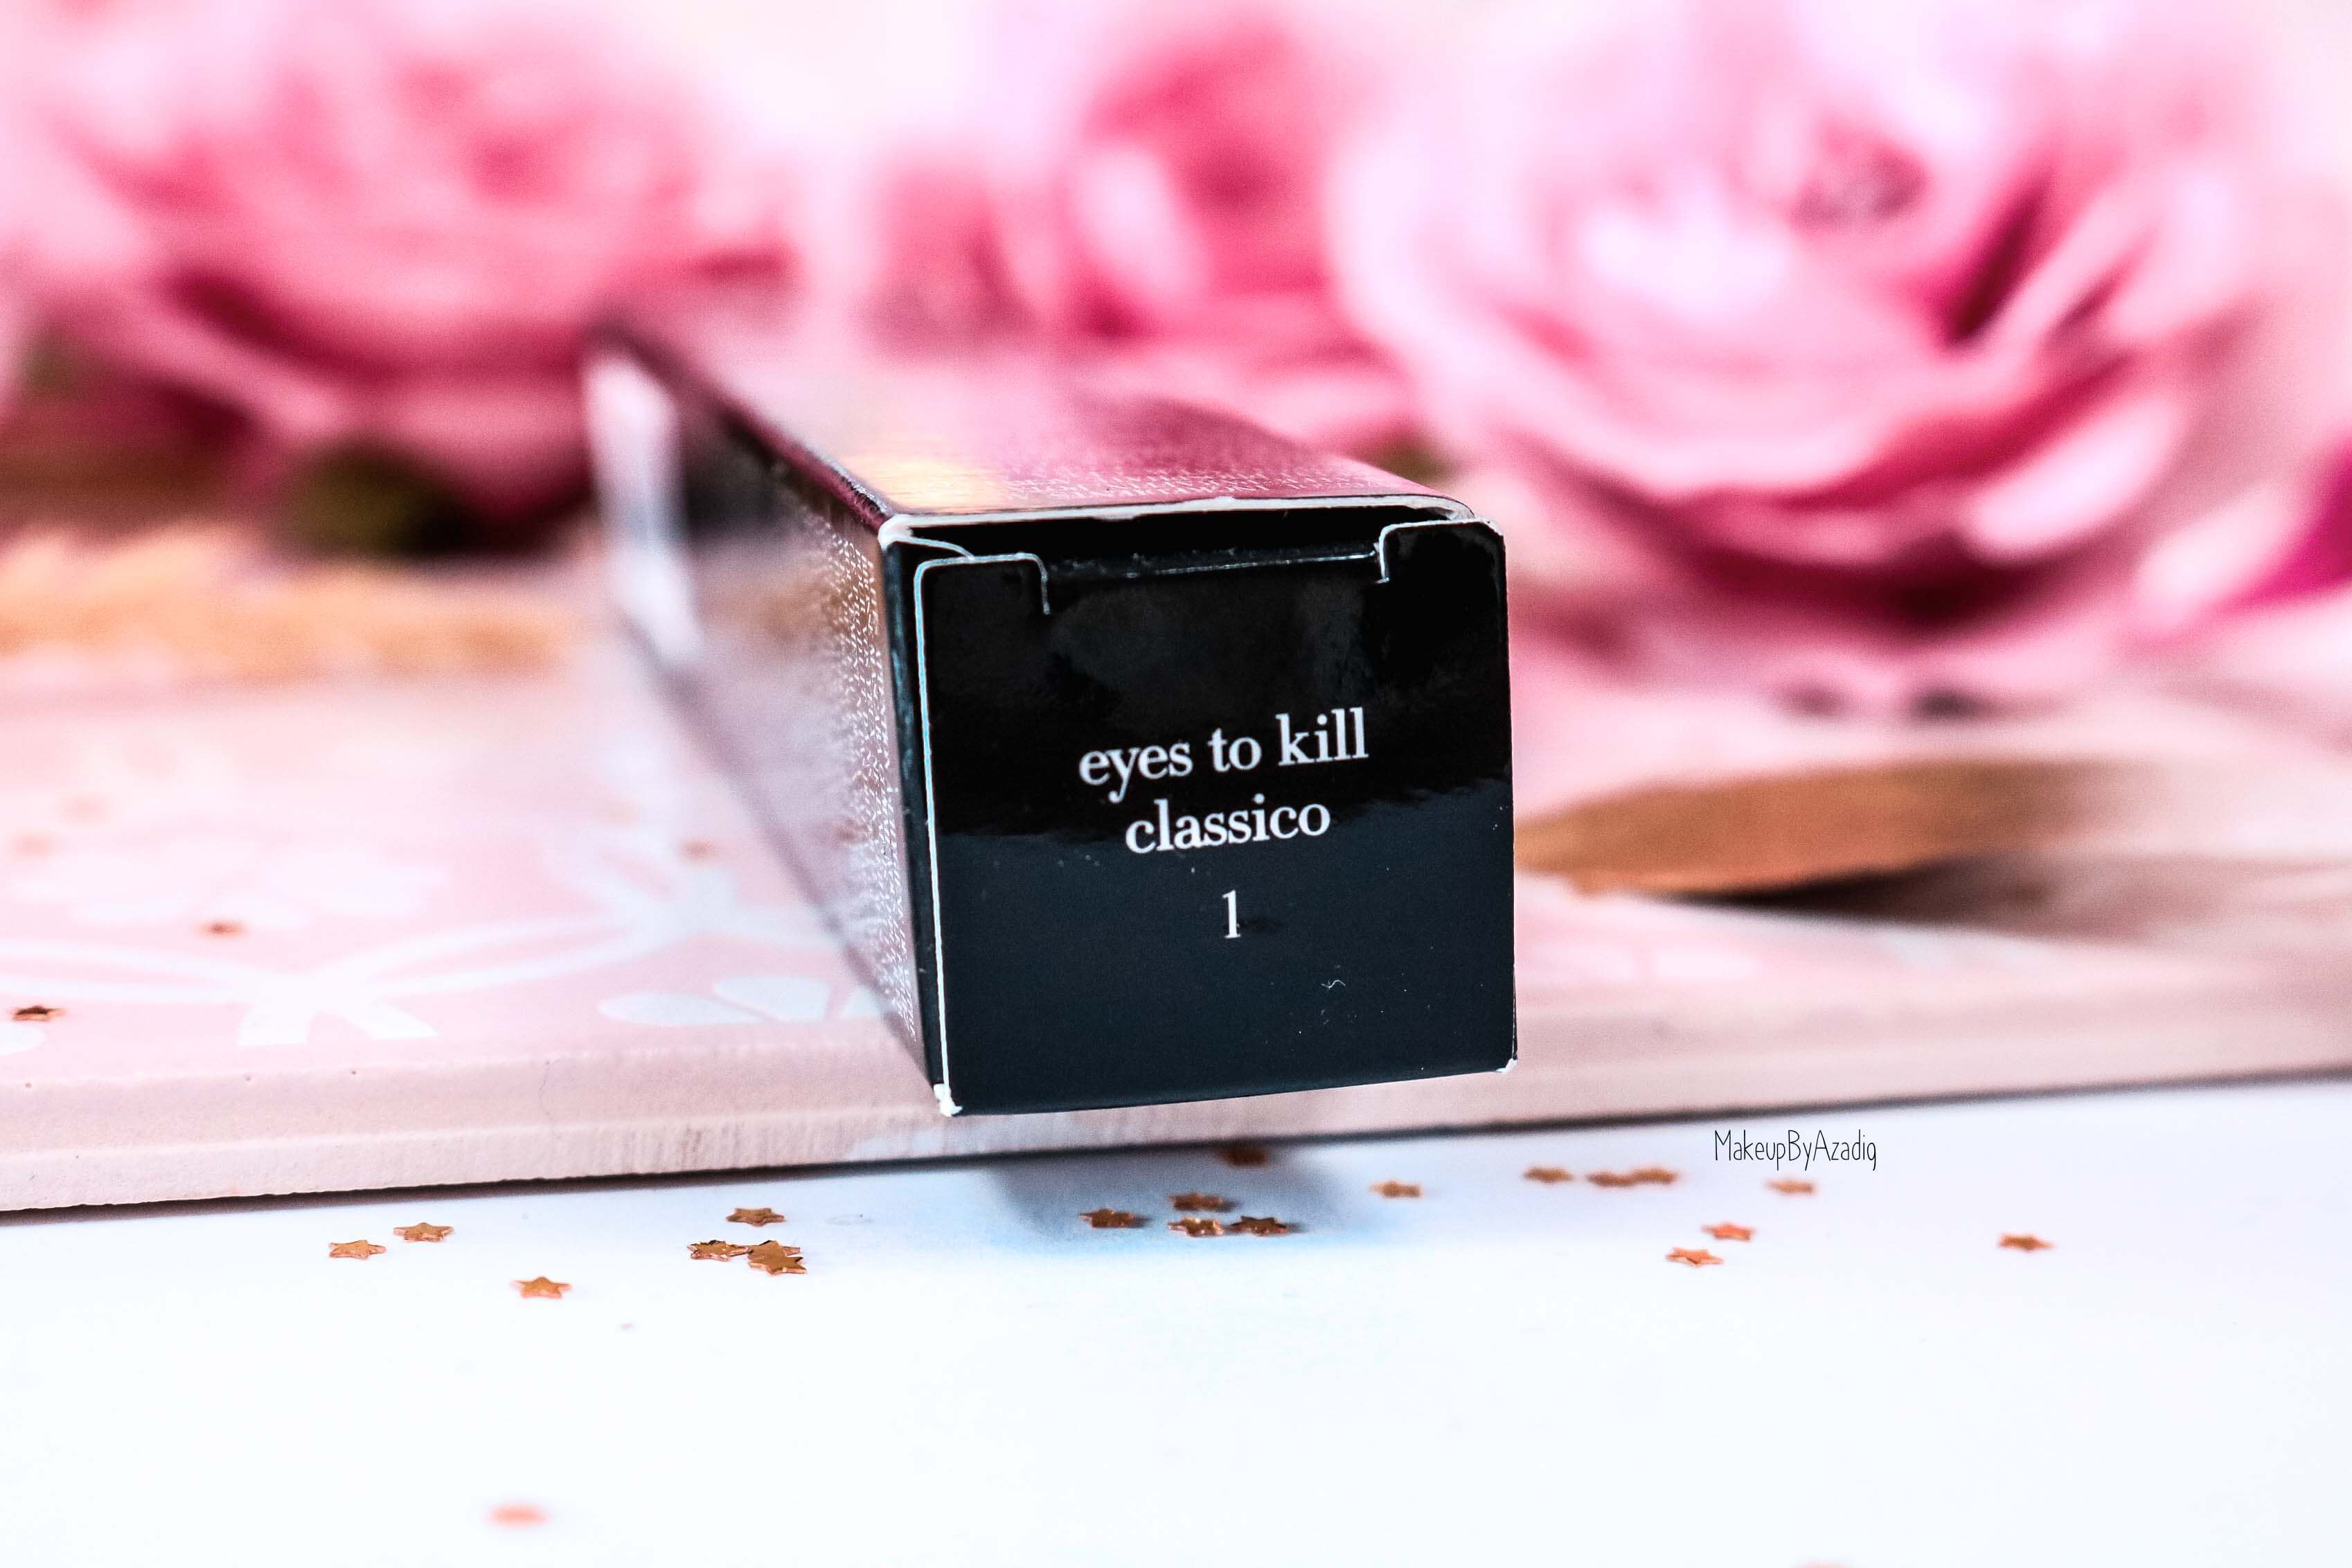 revue-meilleur-mascara-noir-giorgio-armani-eyes-to-kill-classico-volume-longueur-avis-prix-sephora-makeupbyazadig-teinte